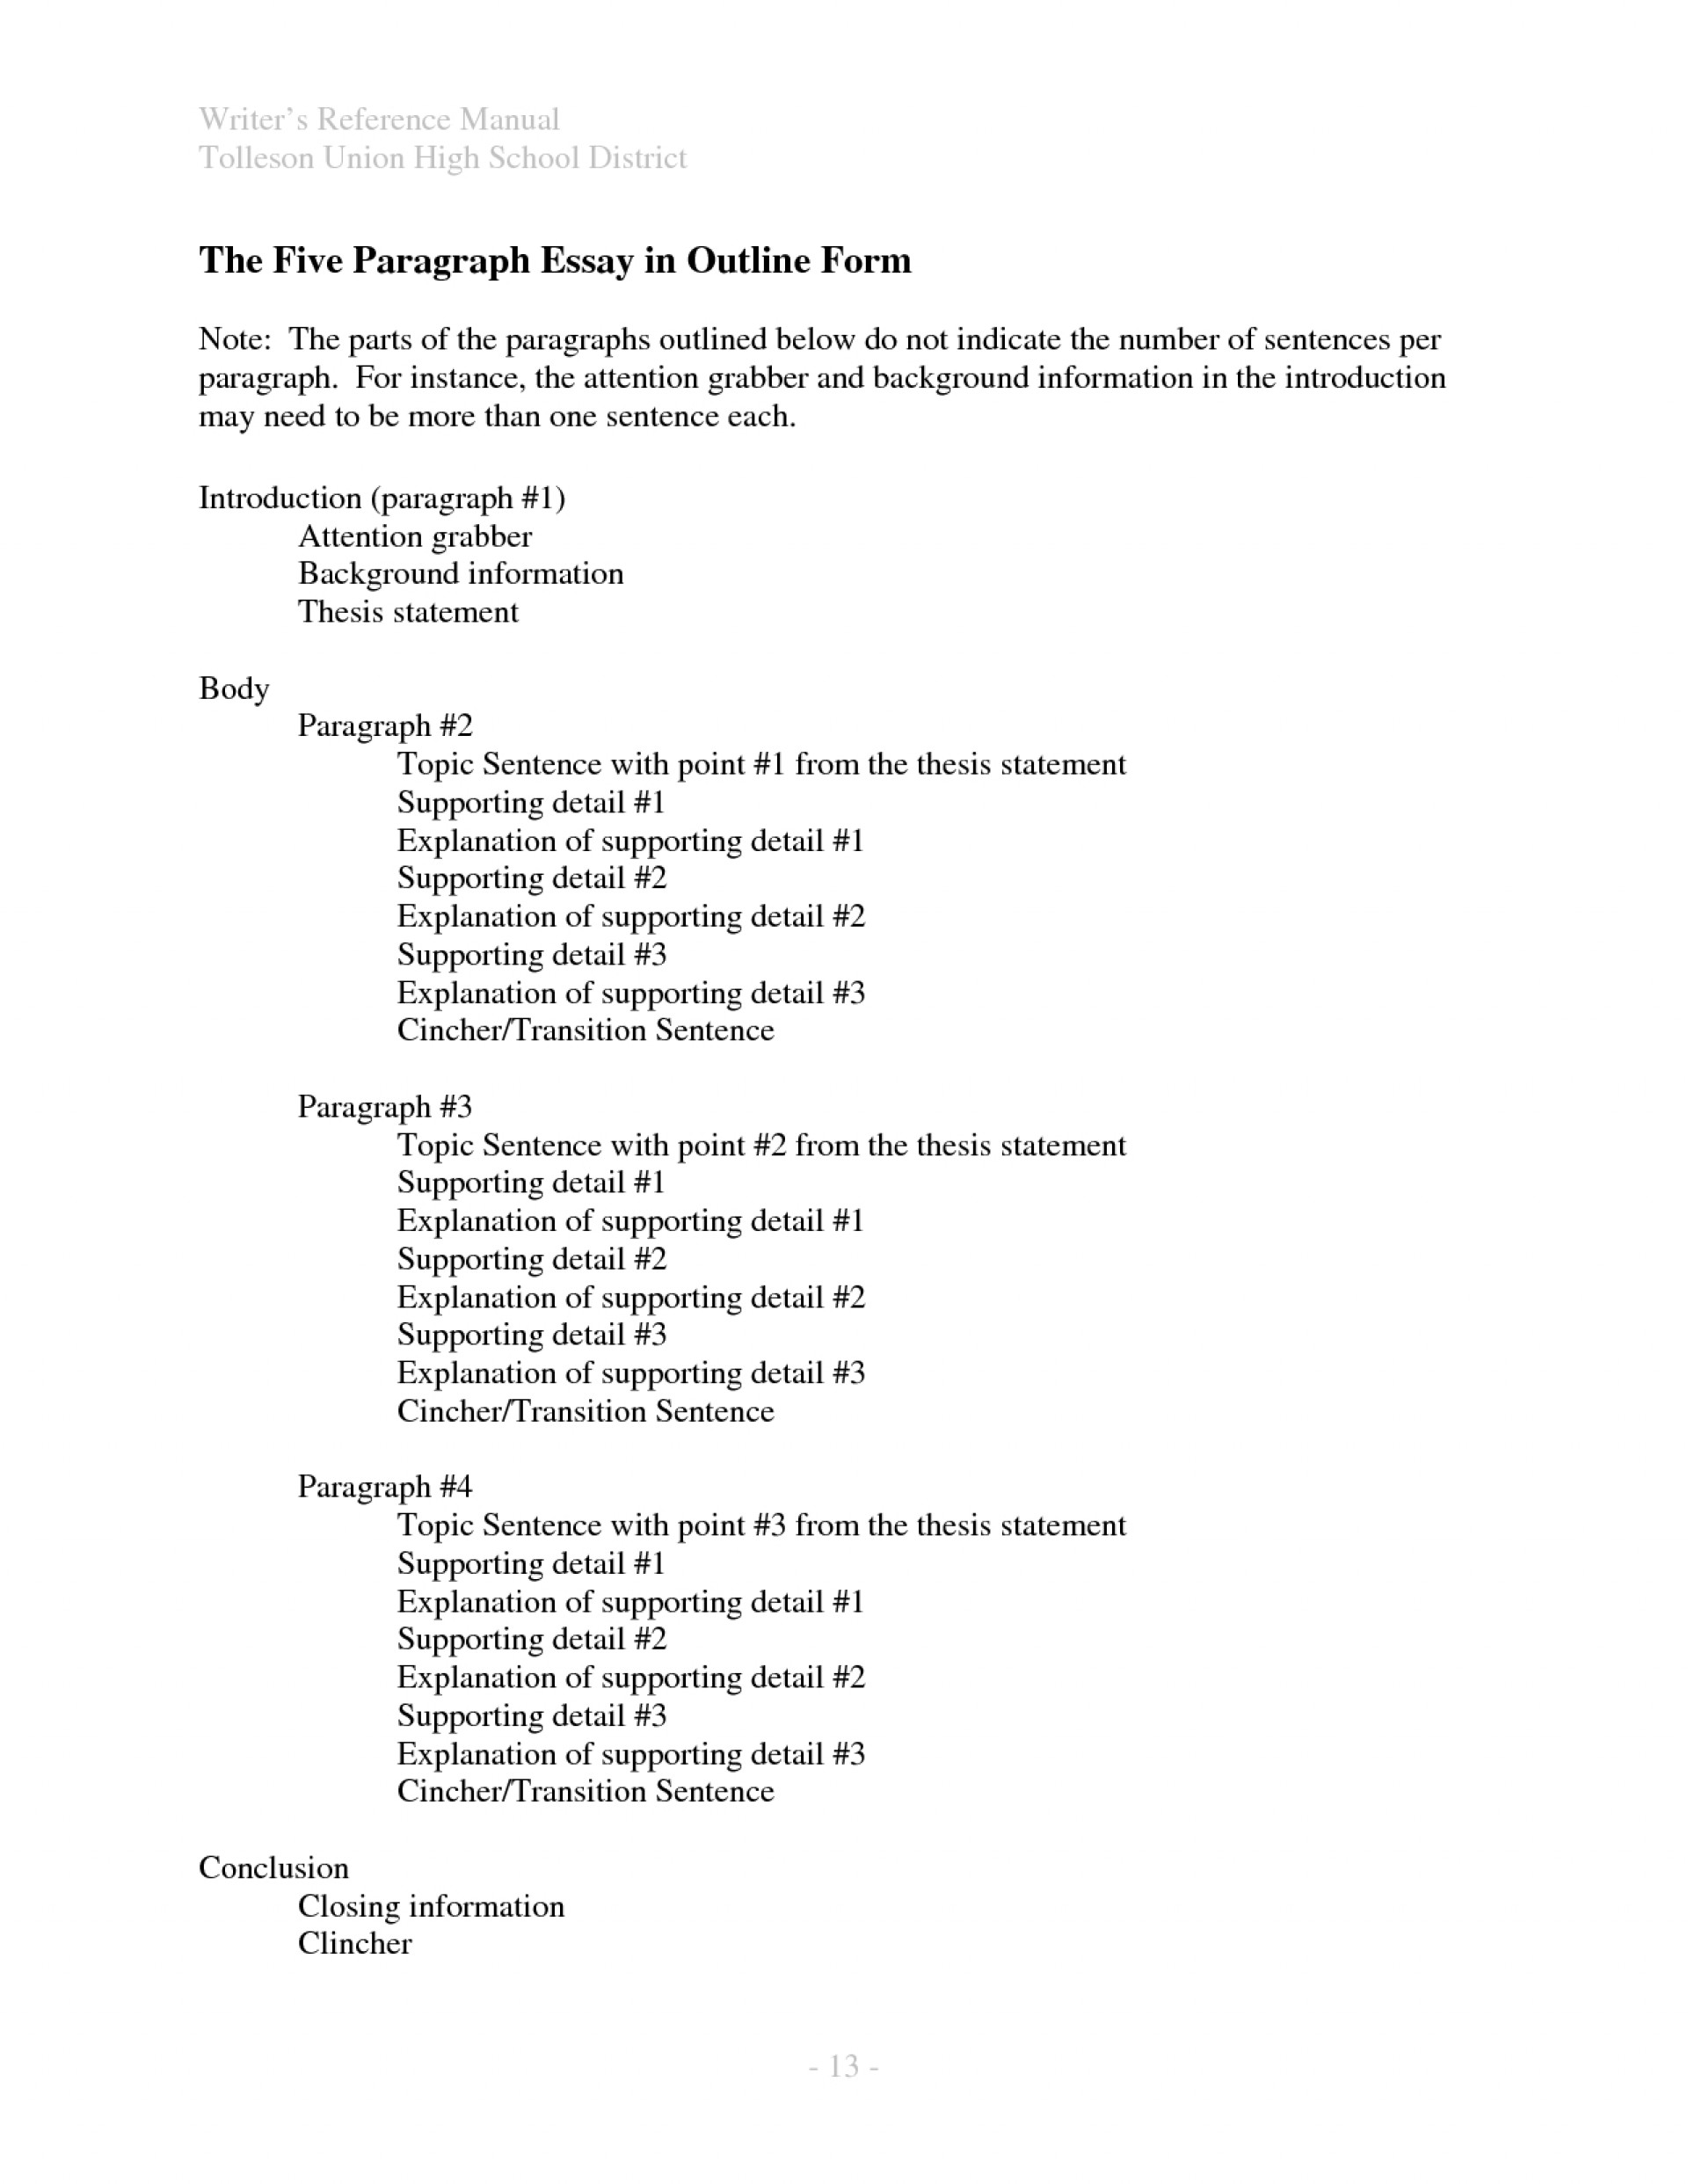 005 Argumentative Essay College Outline Pdf Printables Corner Seaapi Com Wp Content Uploads Argumentativ Caus Stupendous Topics For Middle School Simple Persuasive High 1920